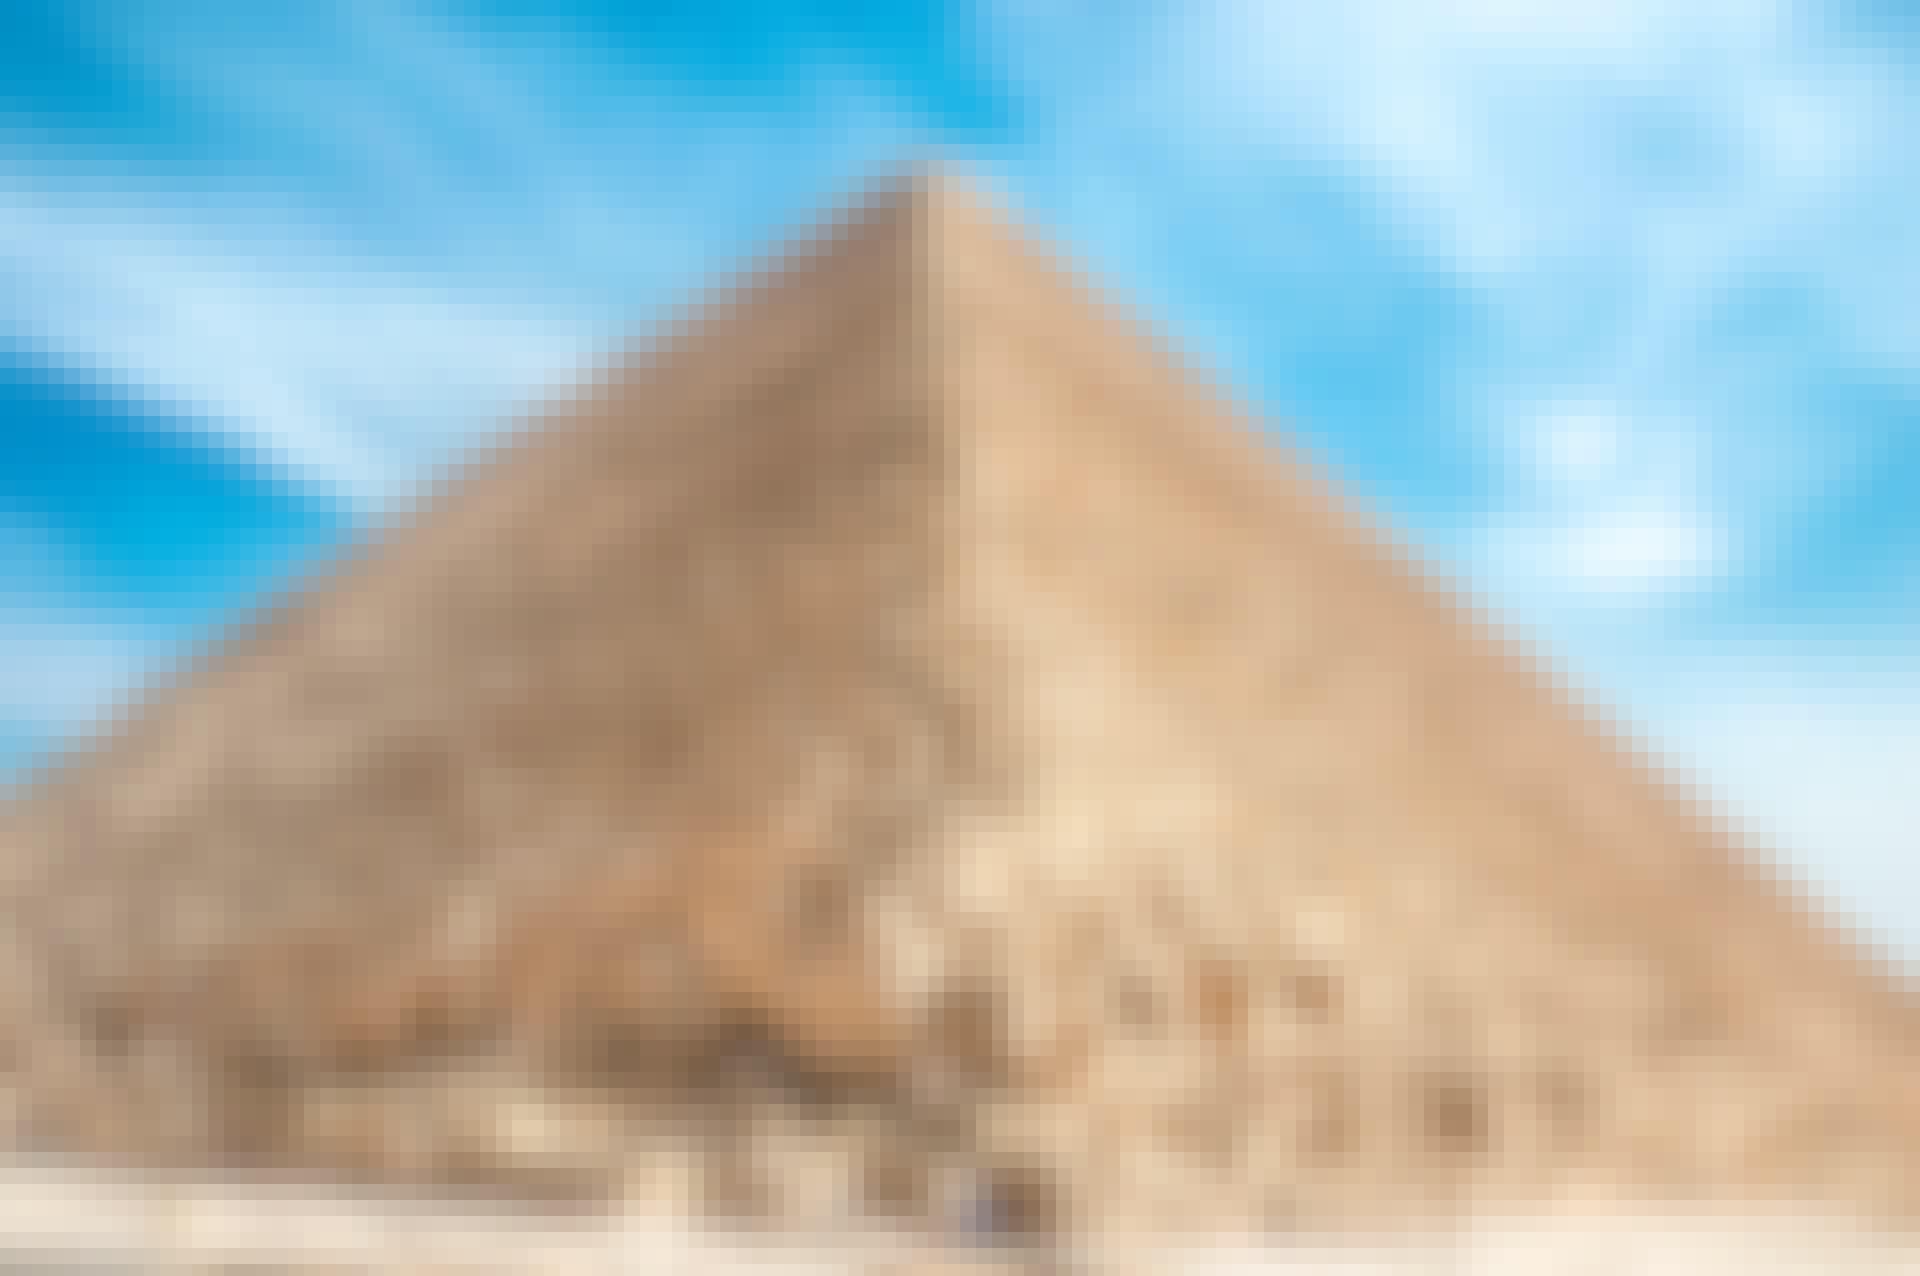 NB u03 pyramide